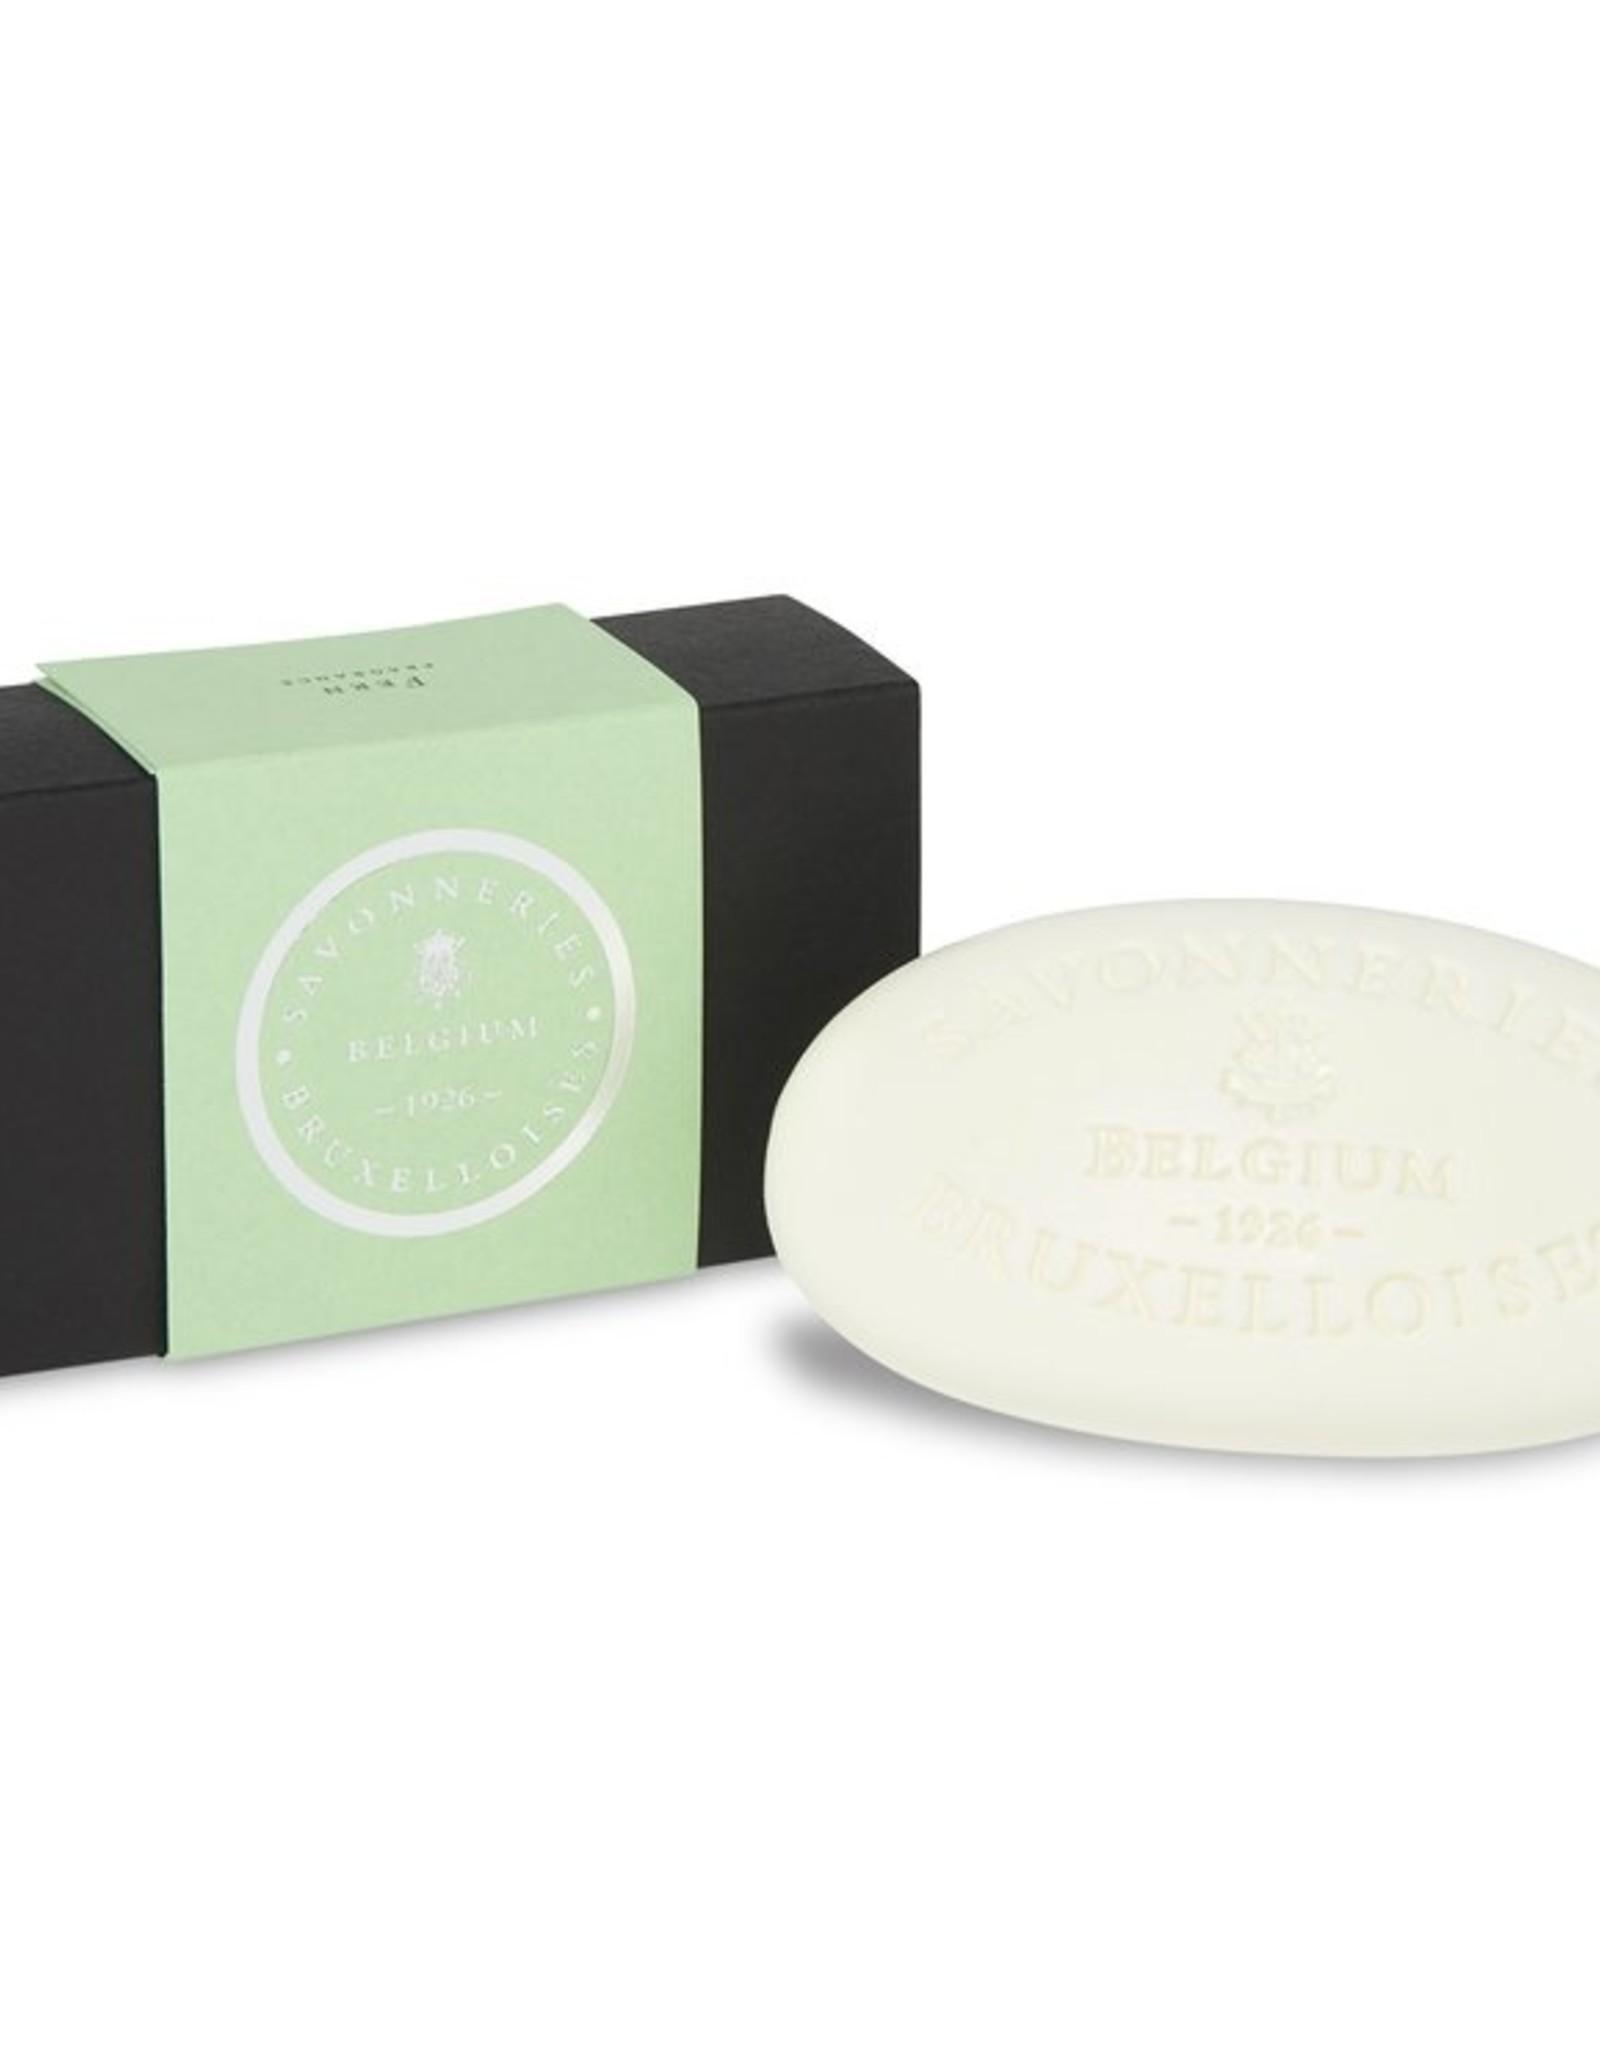 Sweet Bella Savonneries Bruxelloises Fern Soap